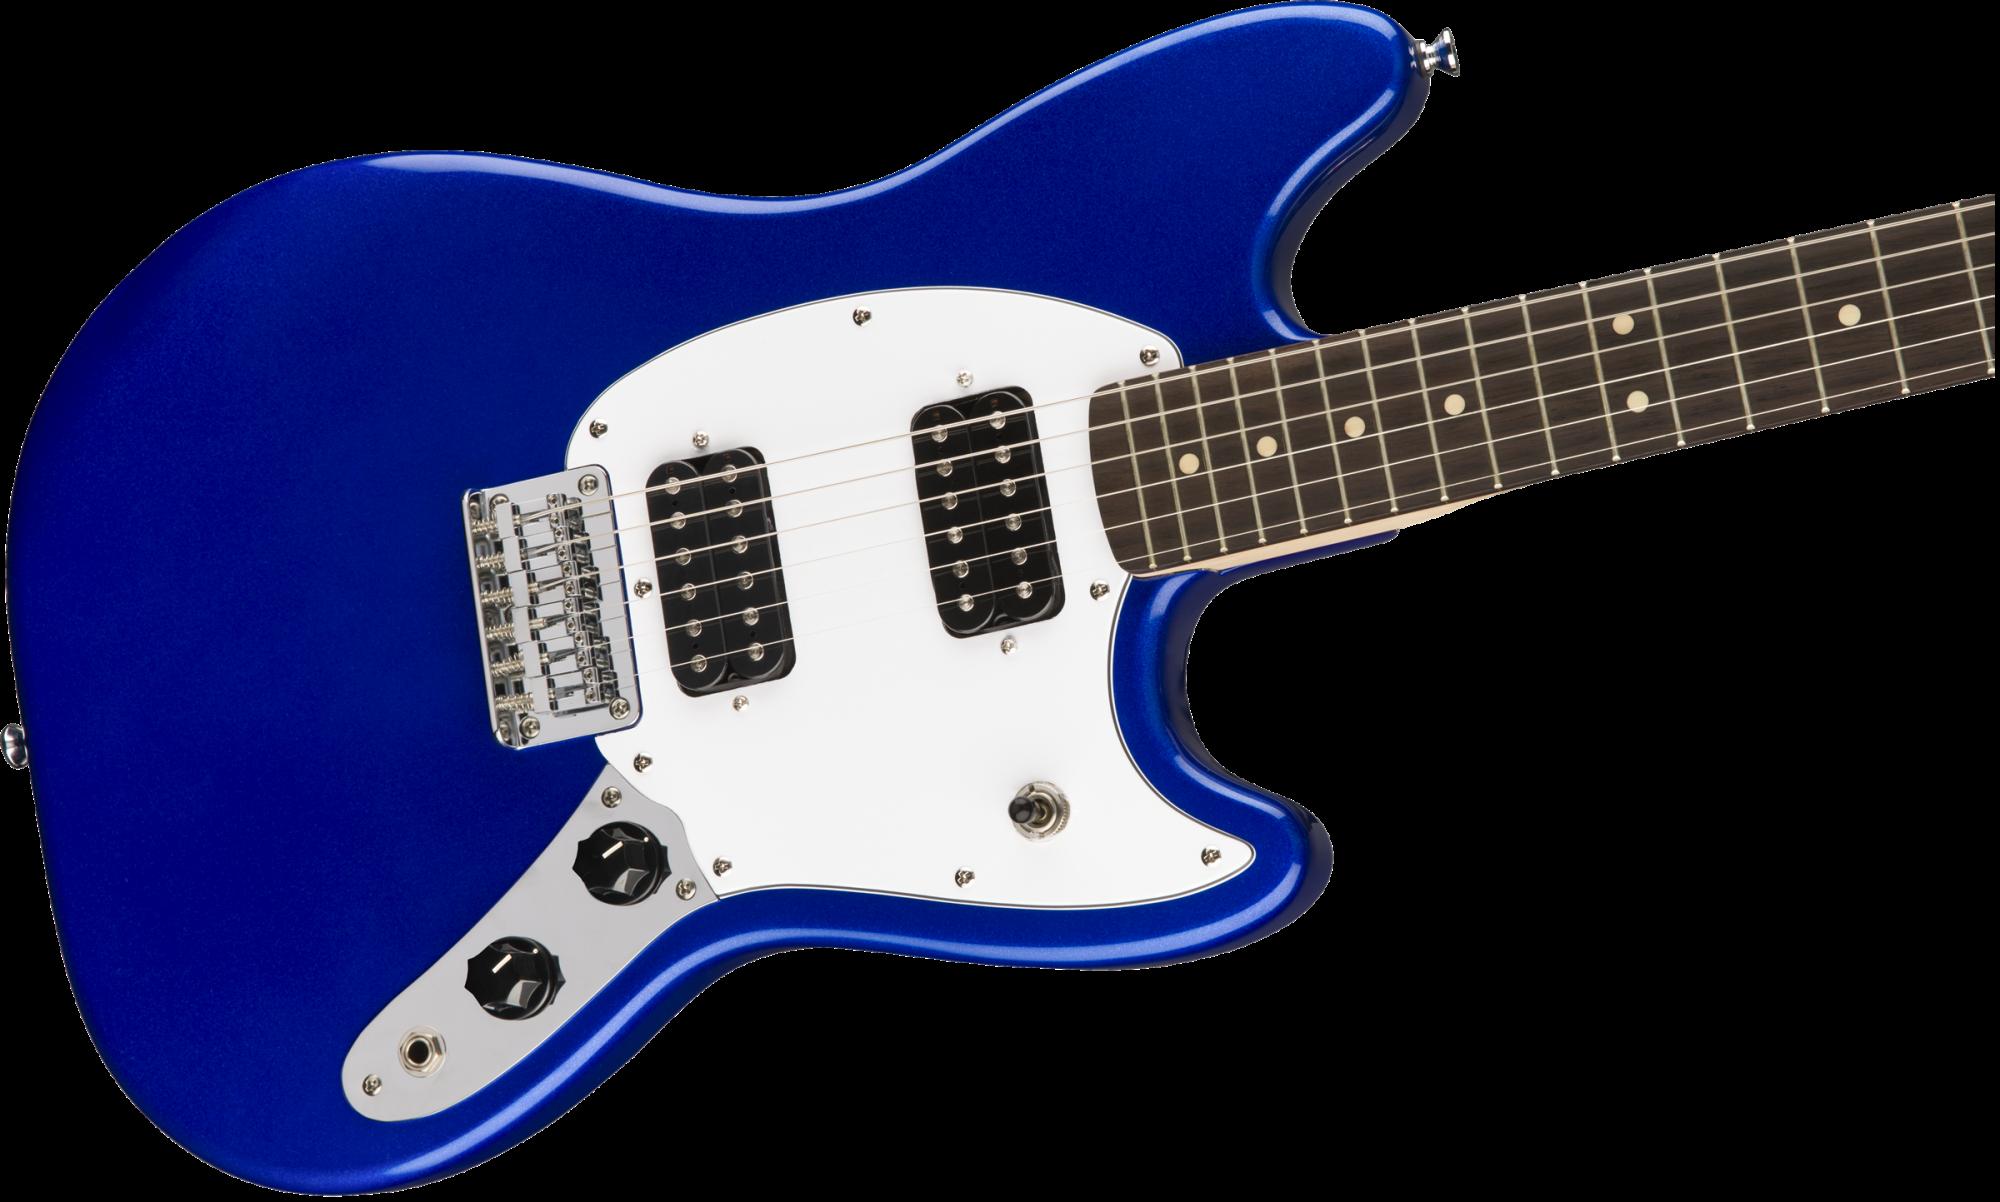 Fender Squier Bullet Mustang HH - Imperial Blue